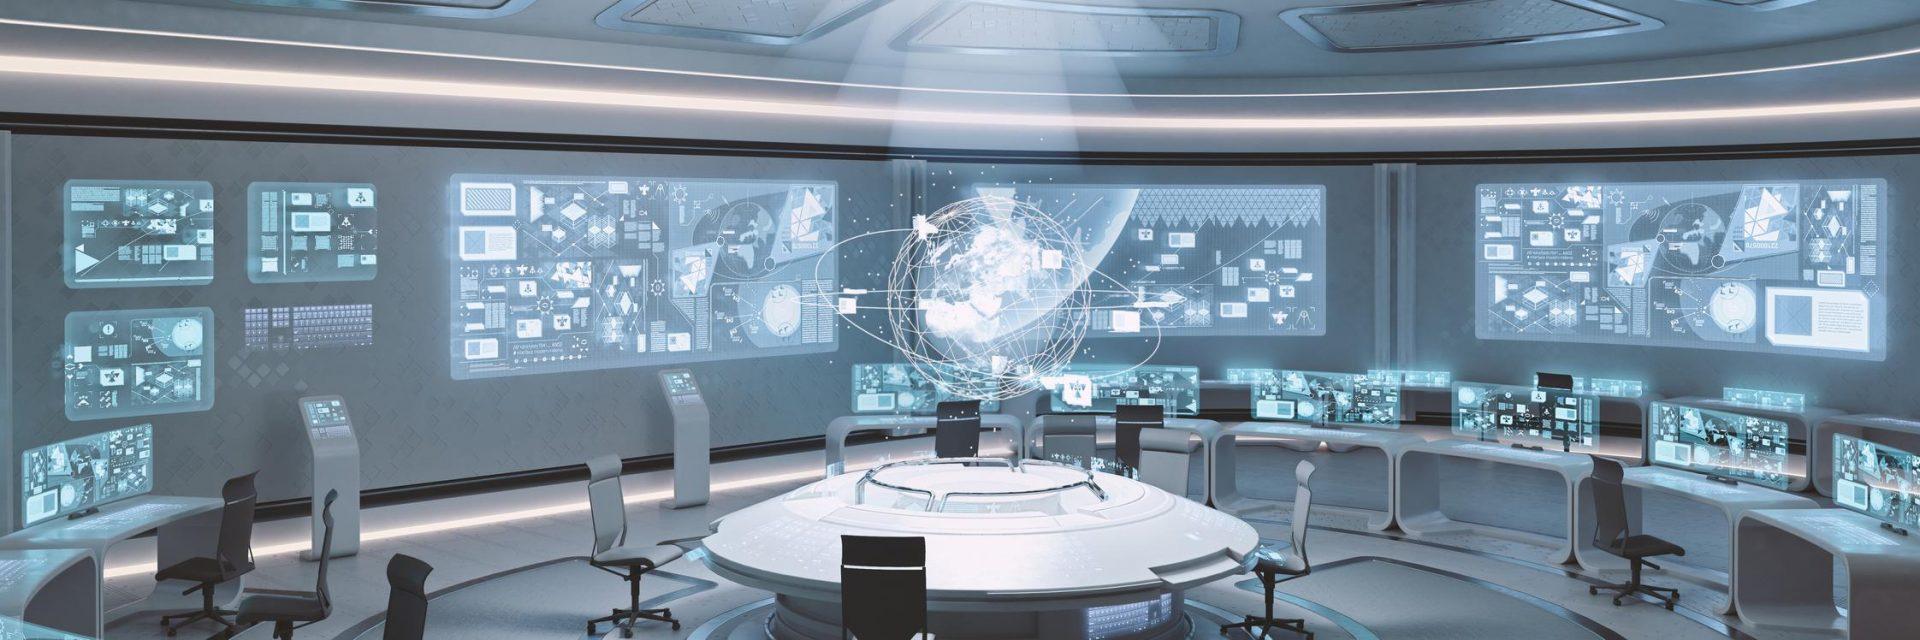 lab future paperless lab